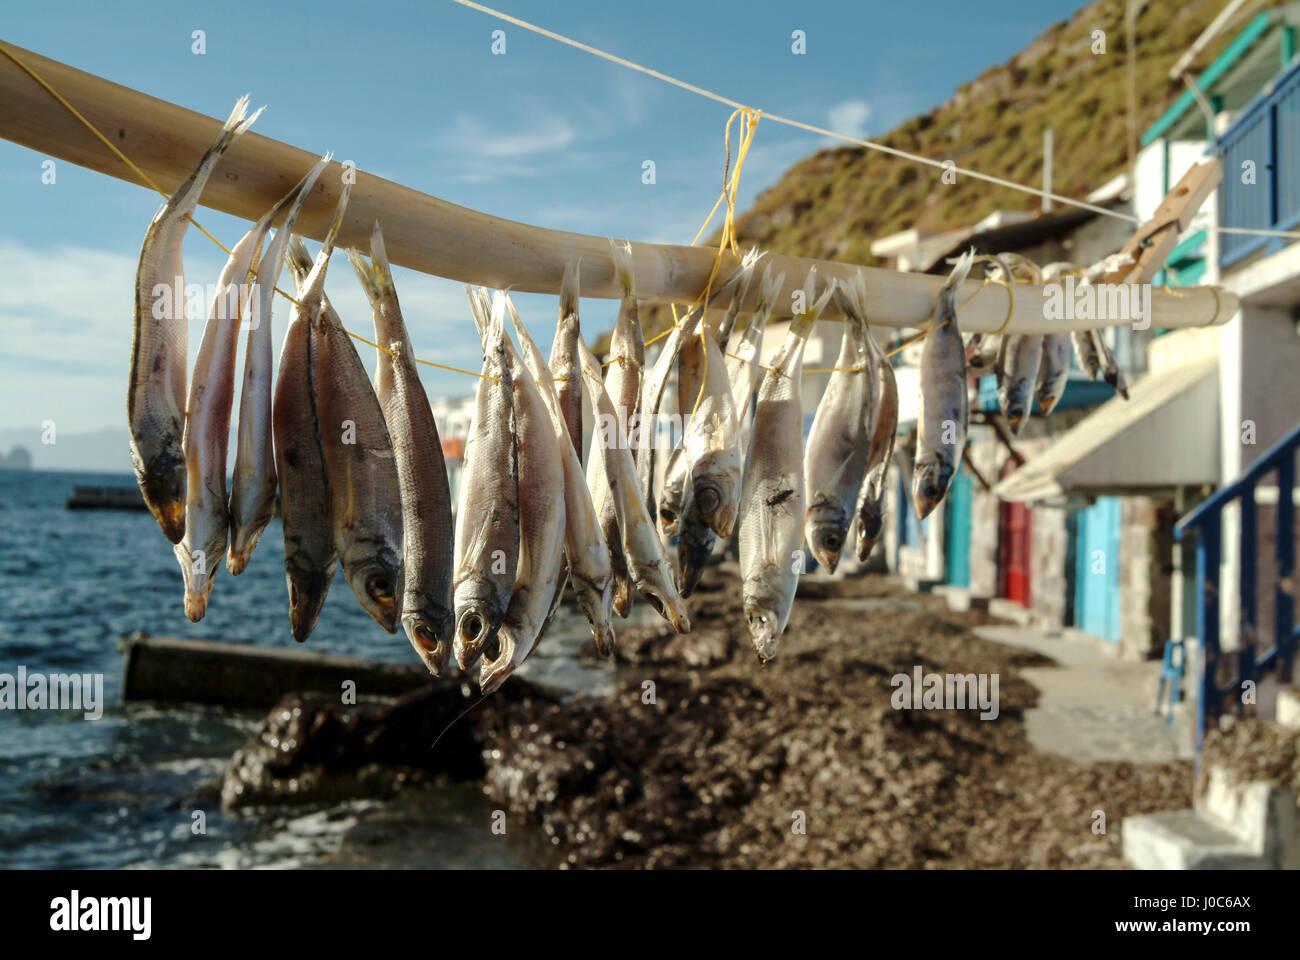 Fish drying on line, Mandrakia Village, Amadas, Milos Island, Greece - Stock Image